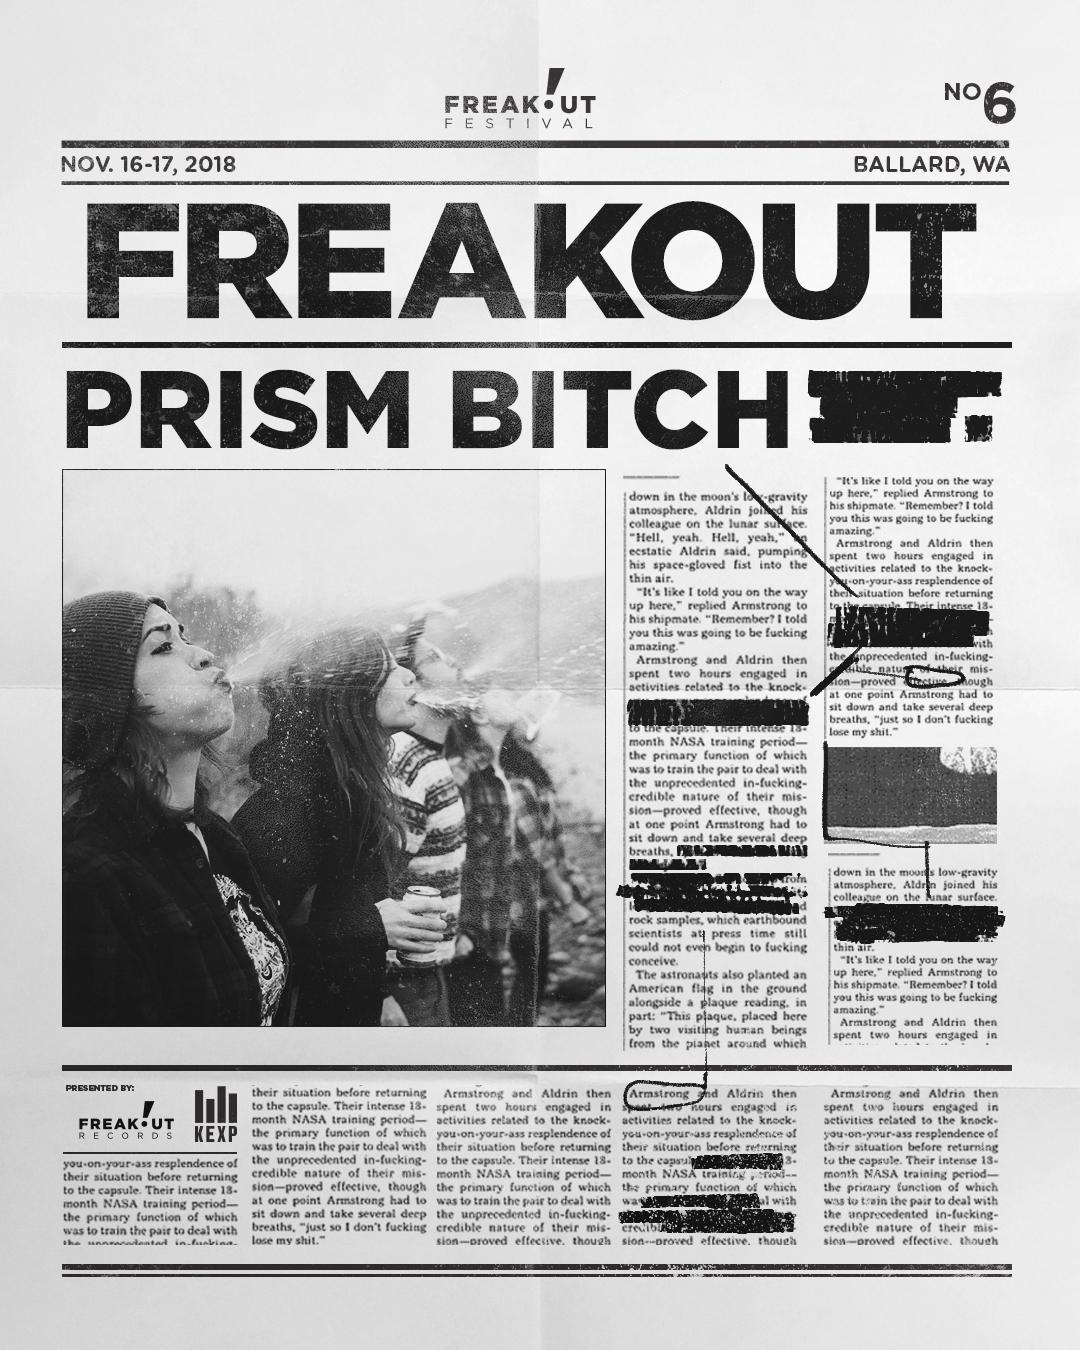 10_PrismBitch_1.jpg